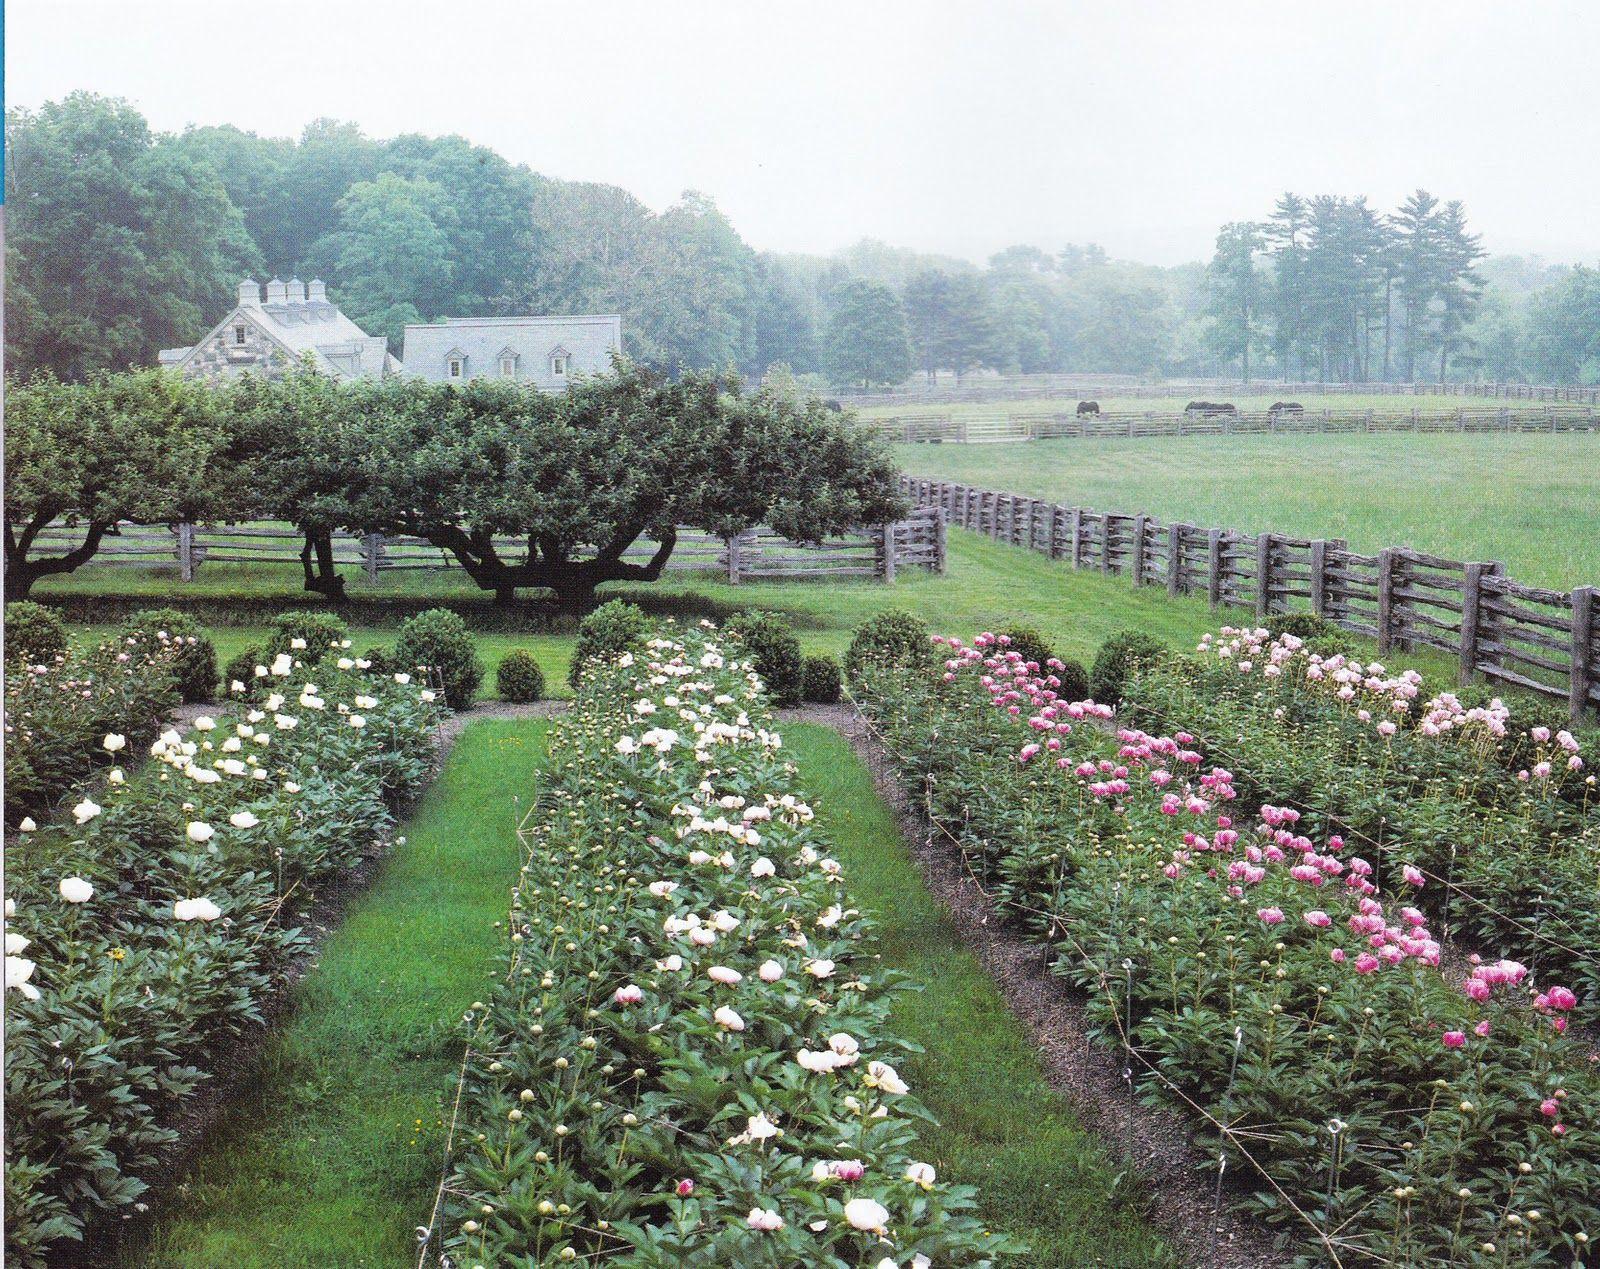 Martha Stewart's peony garden is creative inspiration for